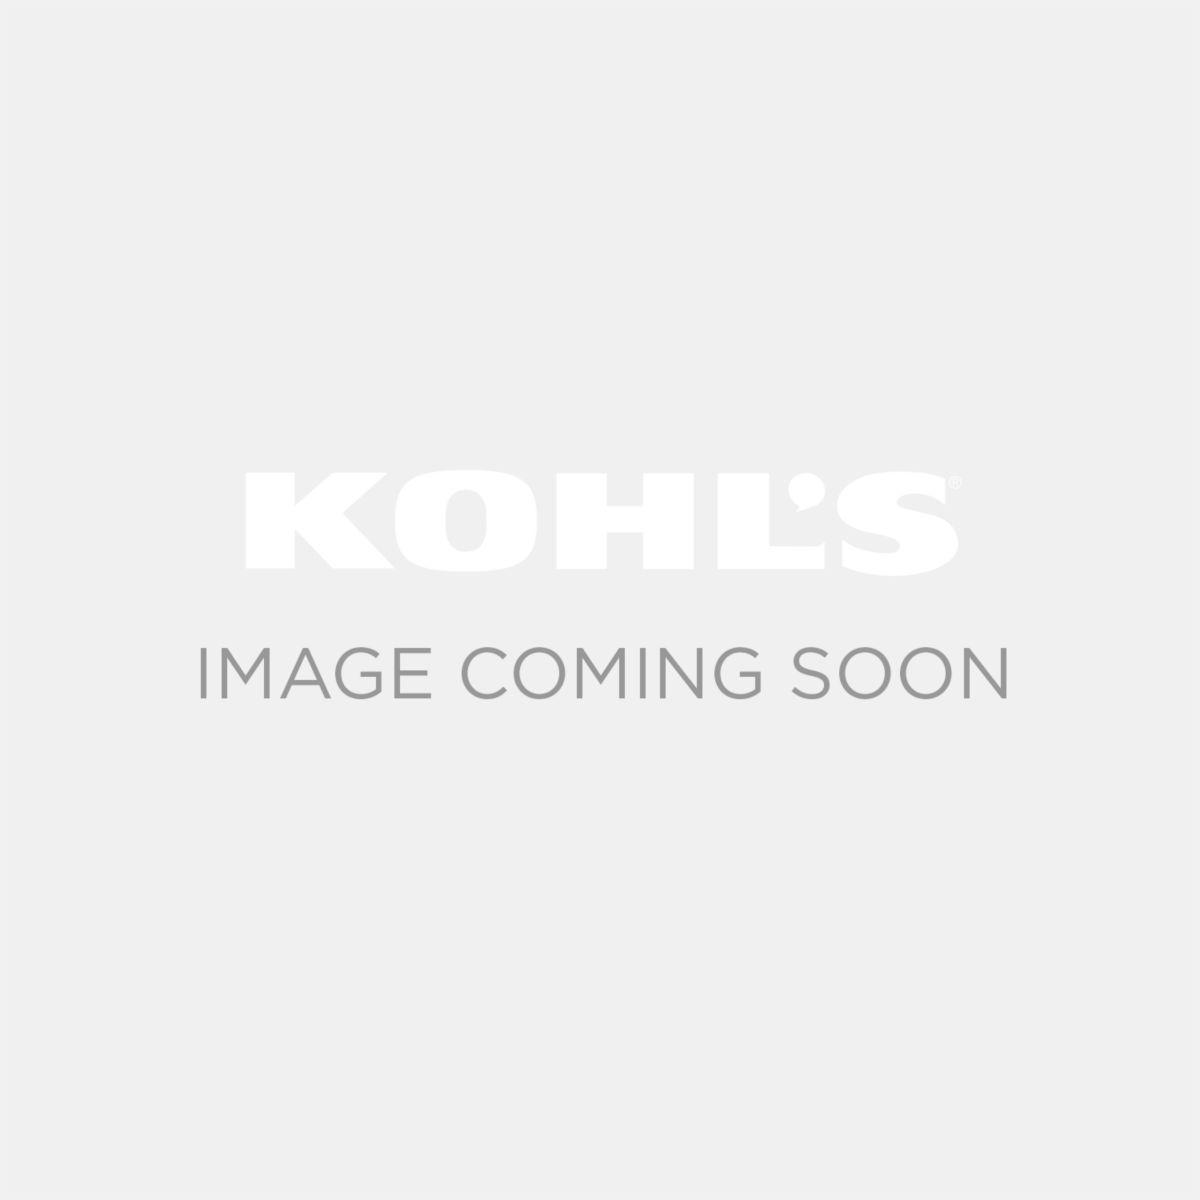 Women's Columbia Black UCF Knights Give & Go Full-Zip Jacket WTwFf